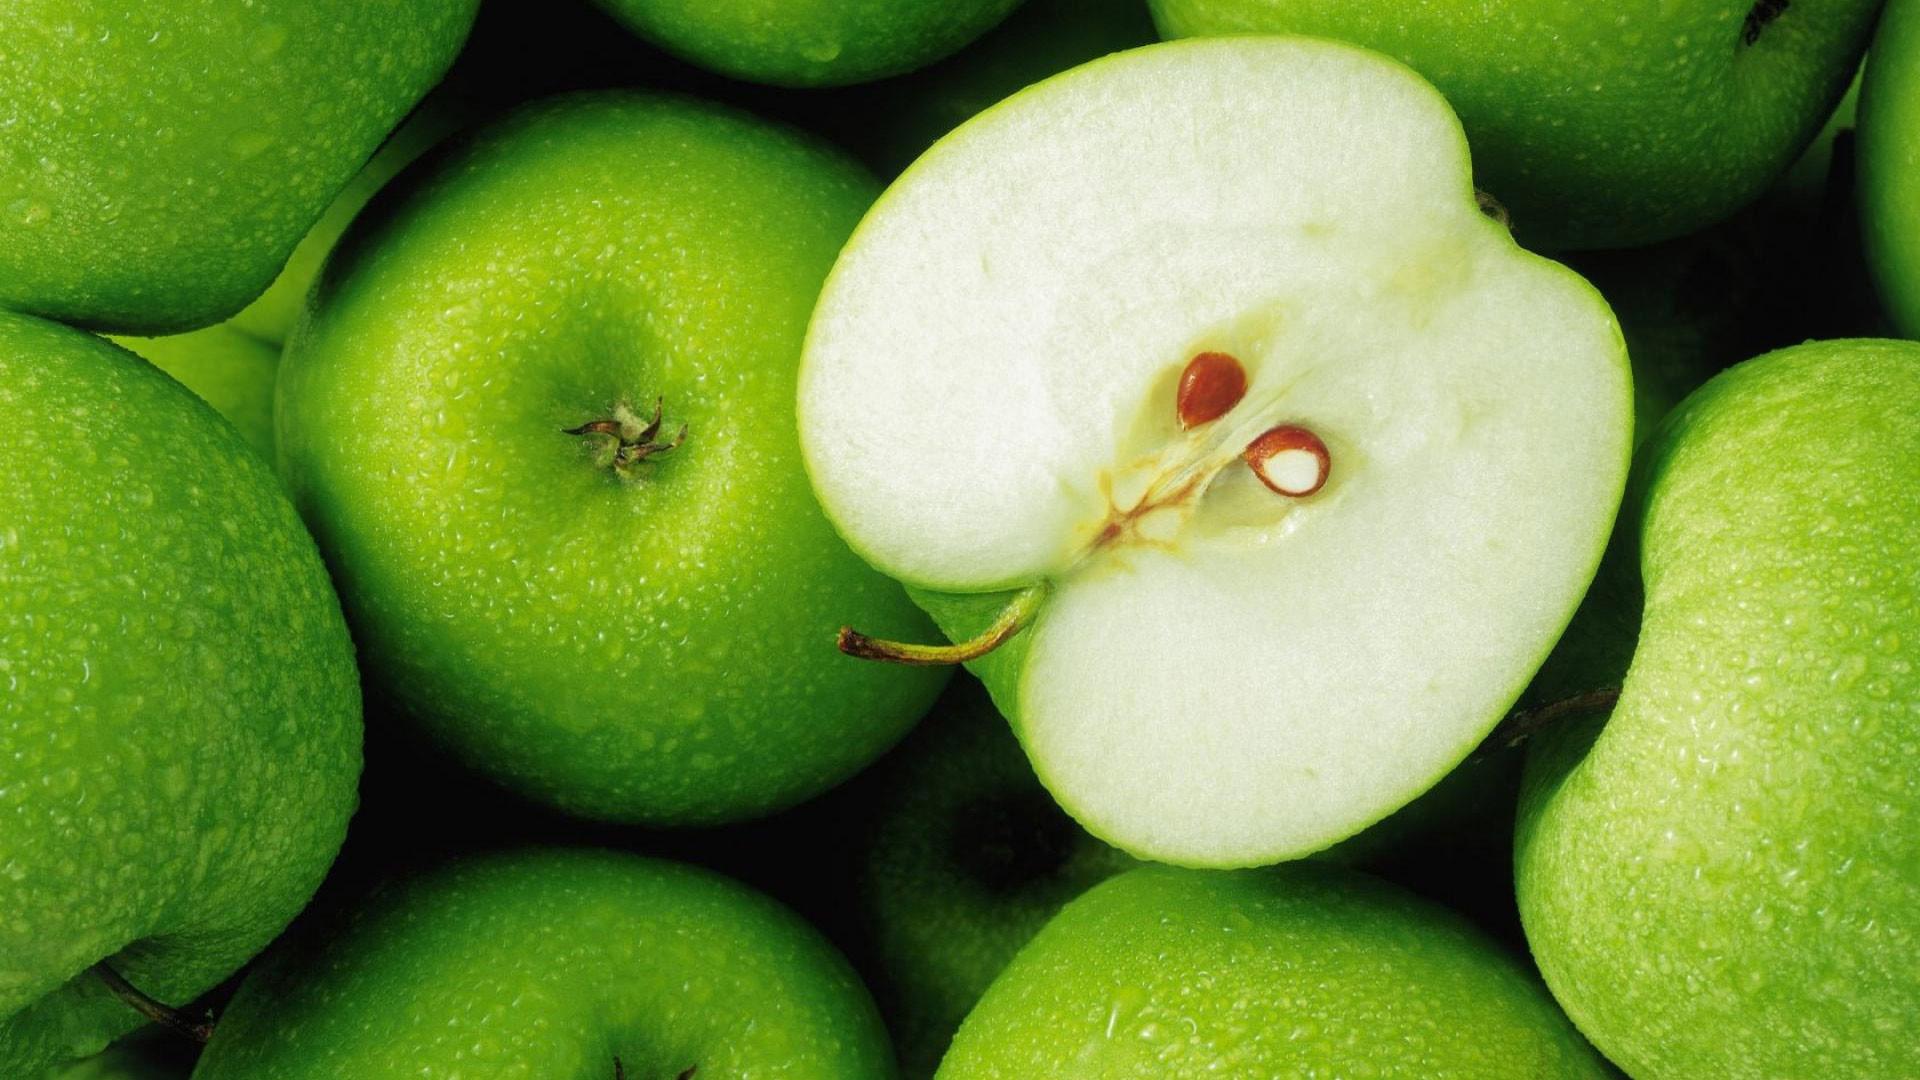 Apple Fruit Hd Pictures Wallpaper